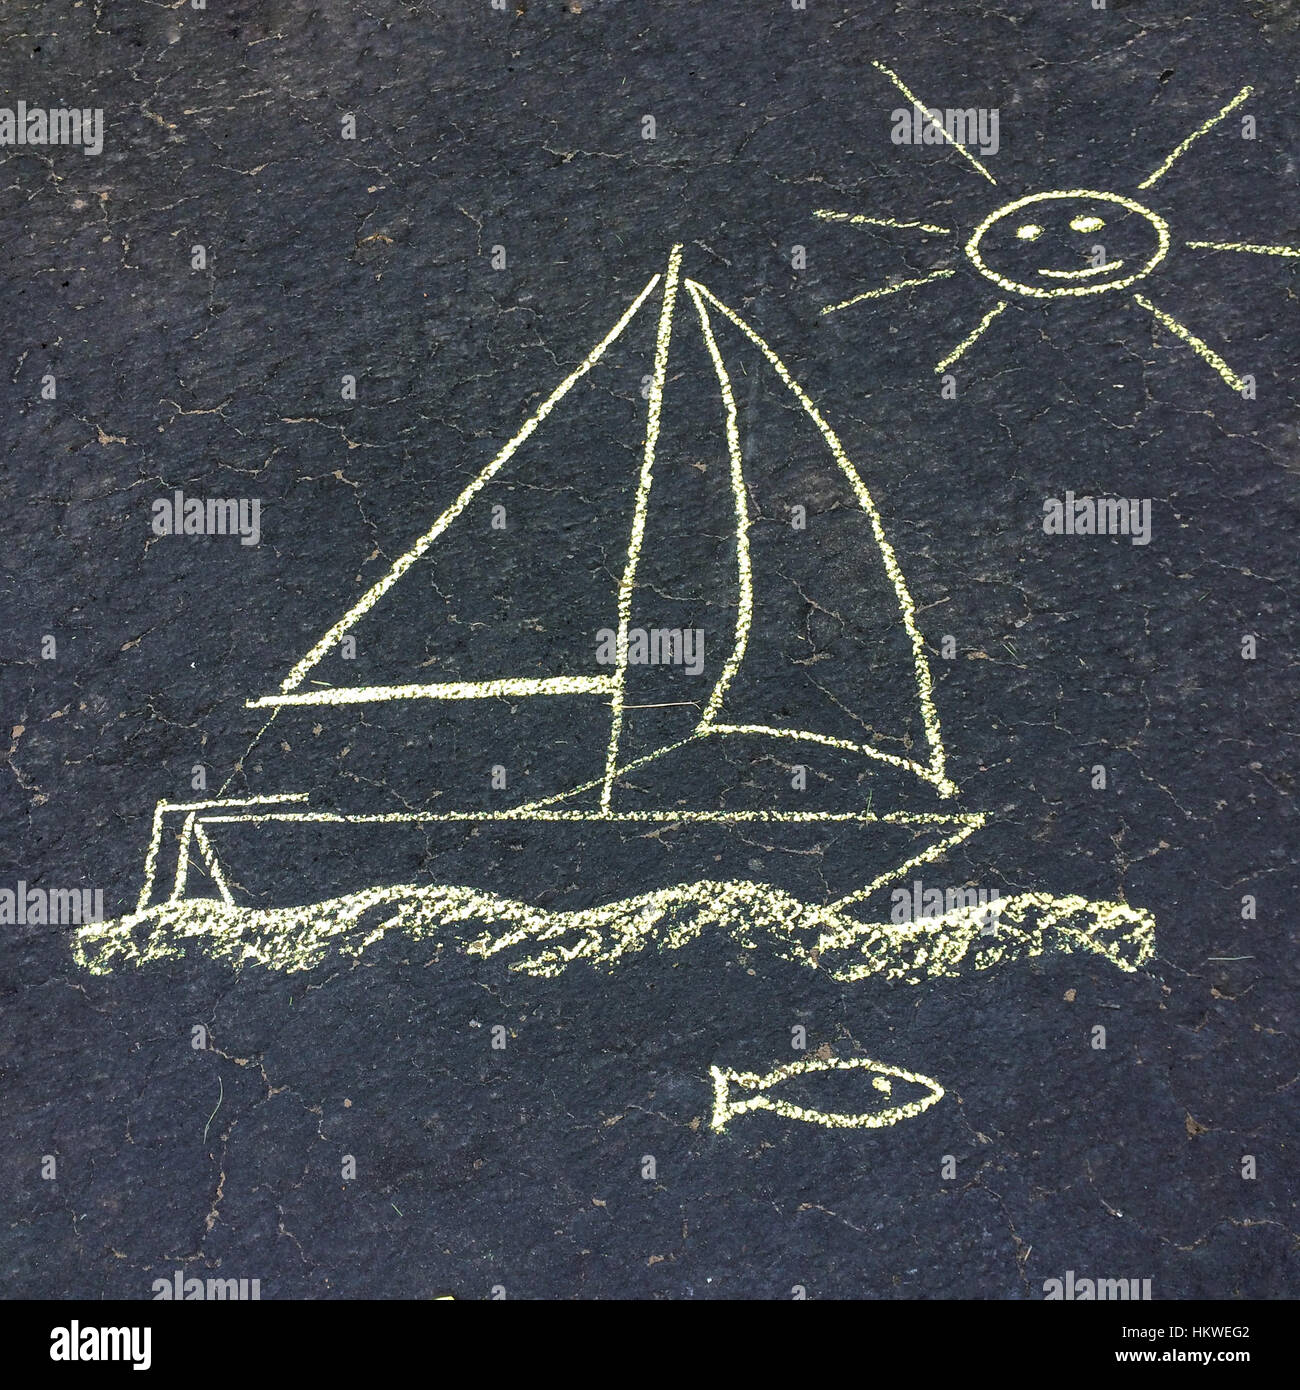 Chalk drawing on an asphalt driveway - Stock Image